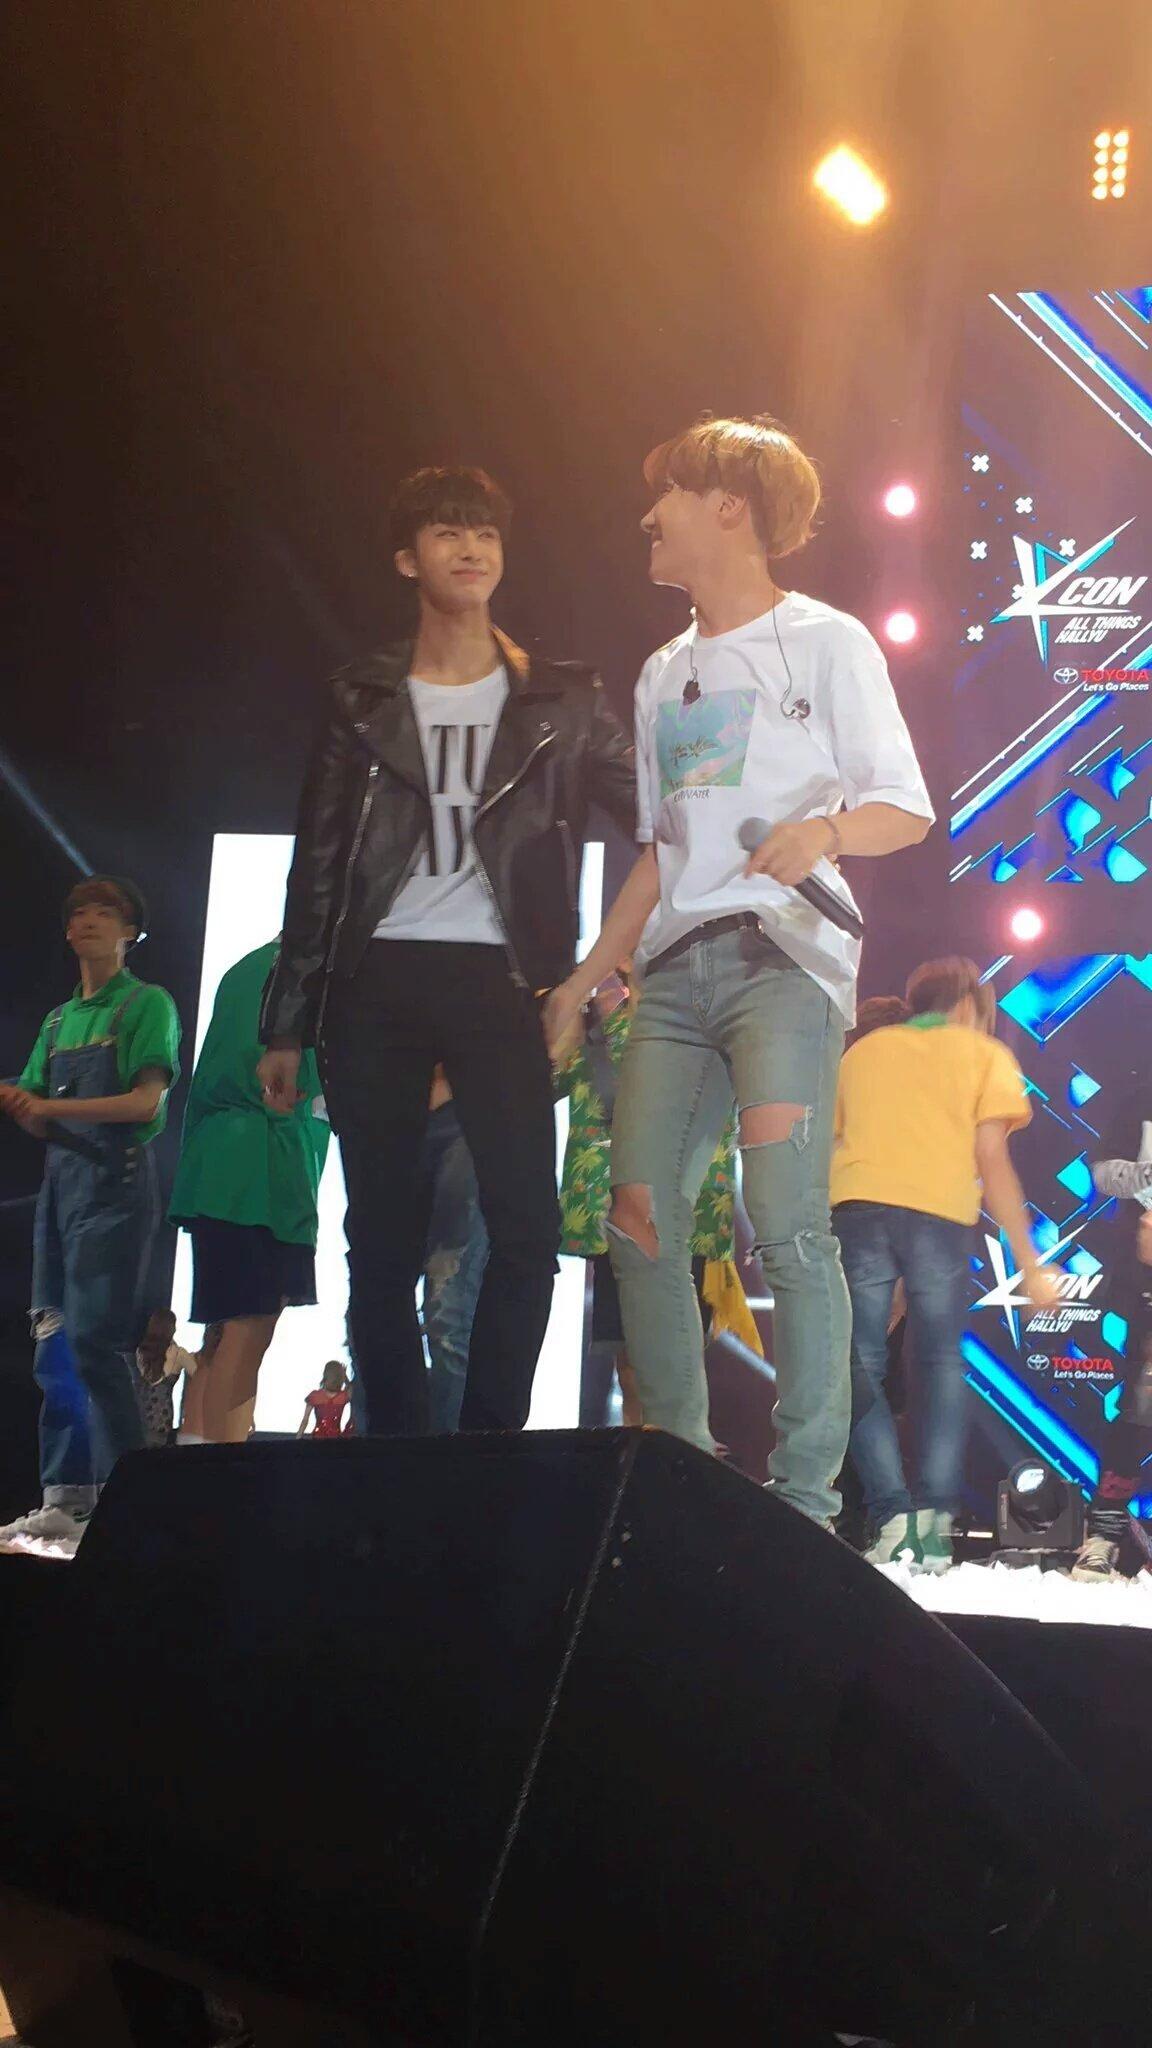 3 bts jhope hoseok monsta x hyungwon @Maylily_BTS